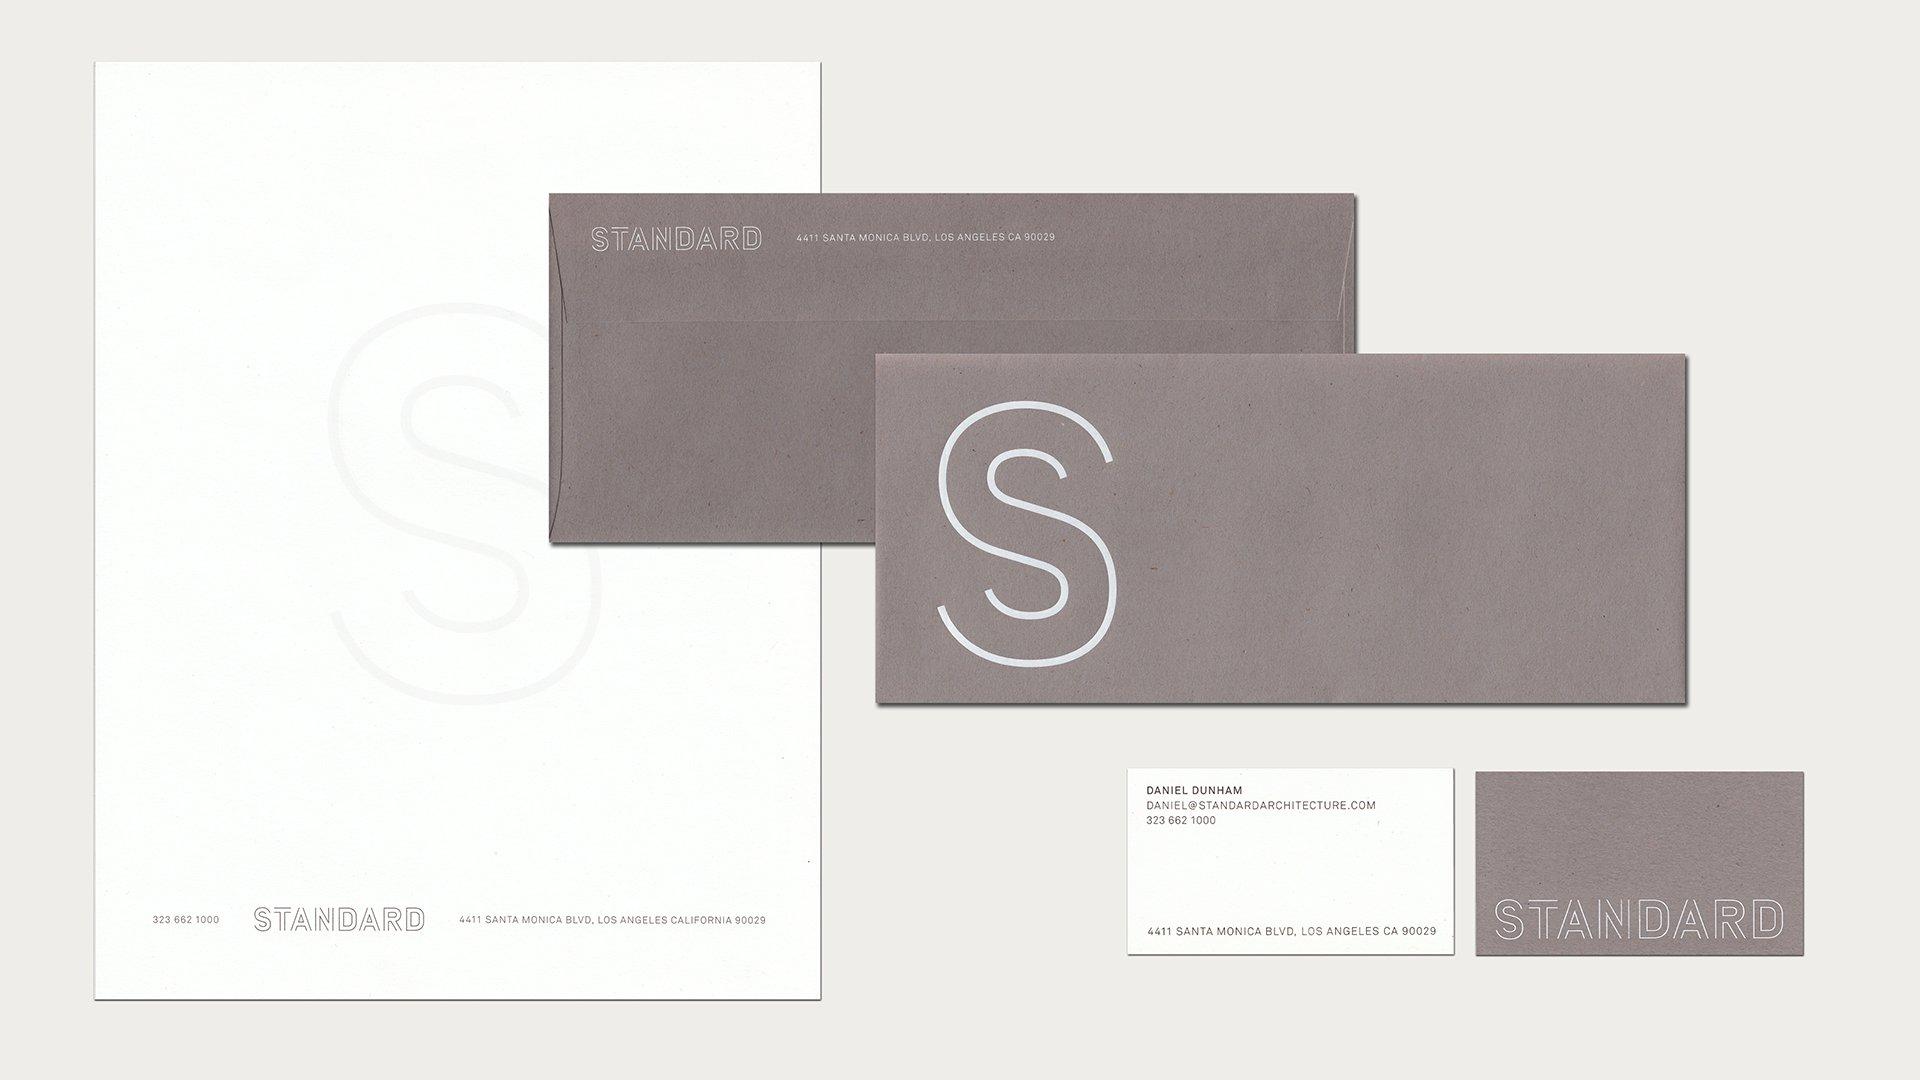 Standard Architecture letterhead branding